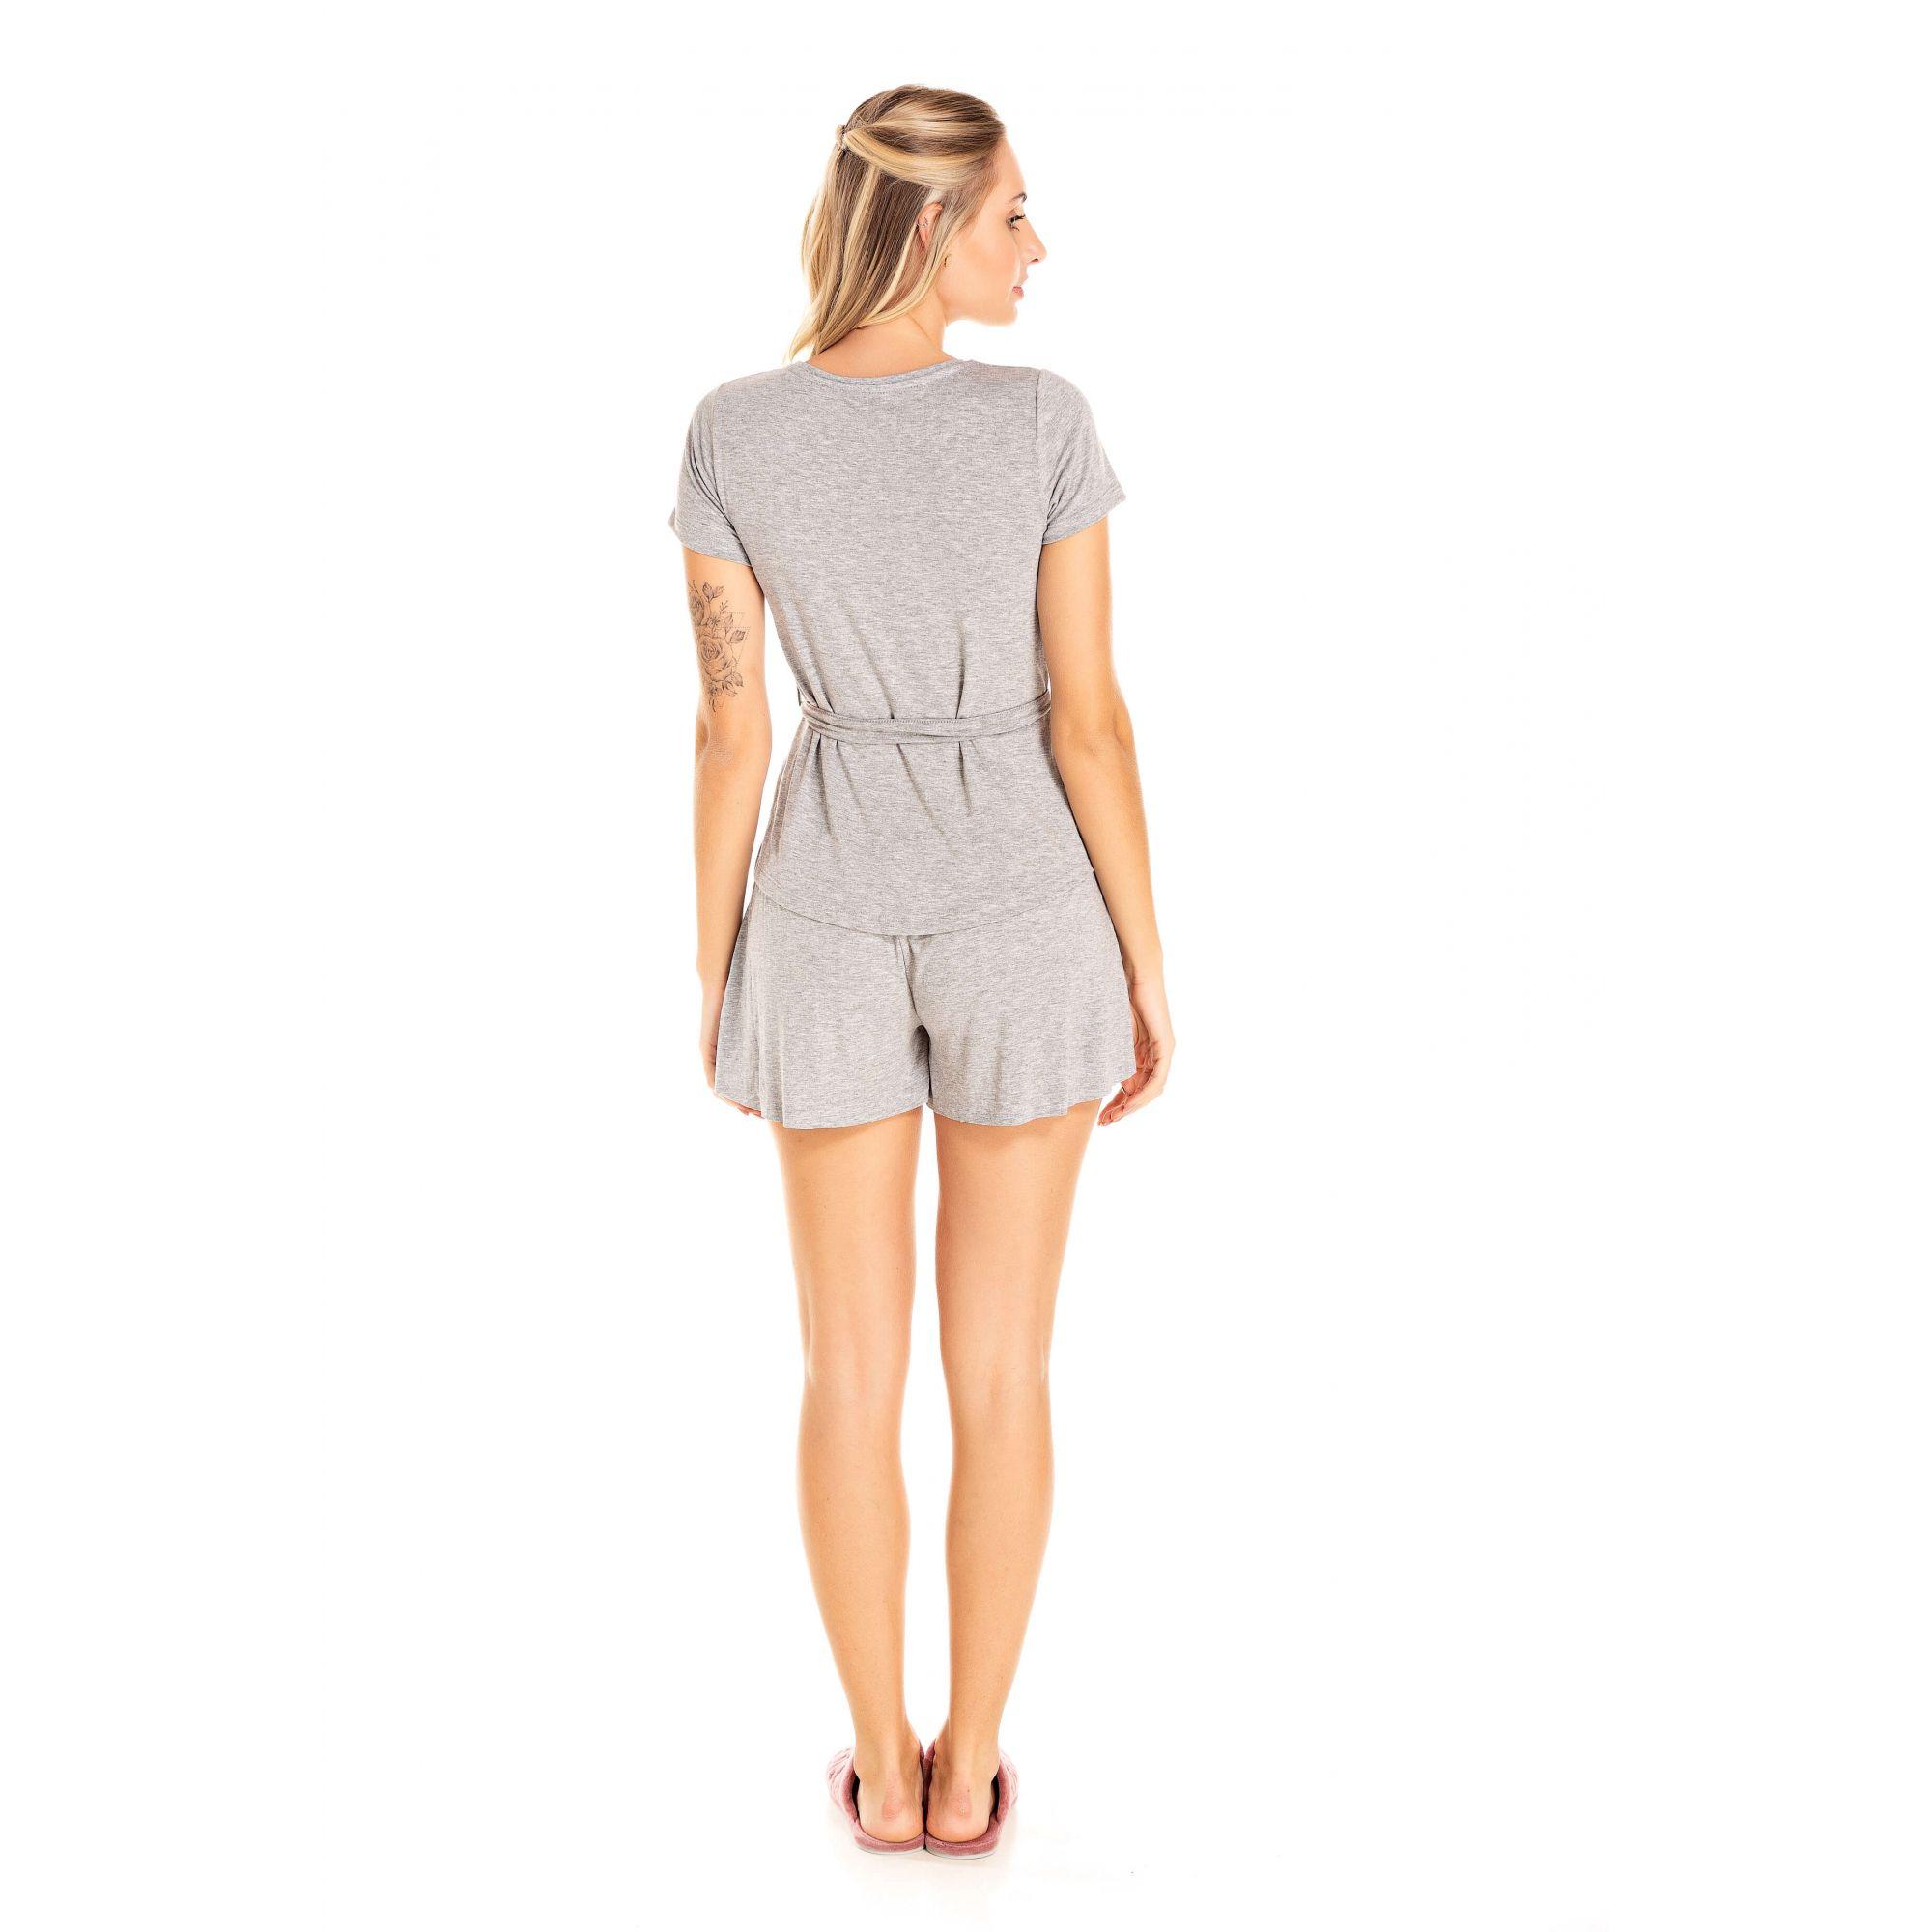 230/E - Short Doll Adulto Feminino Viscolycra